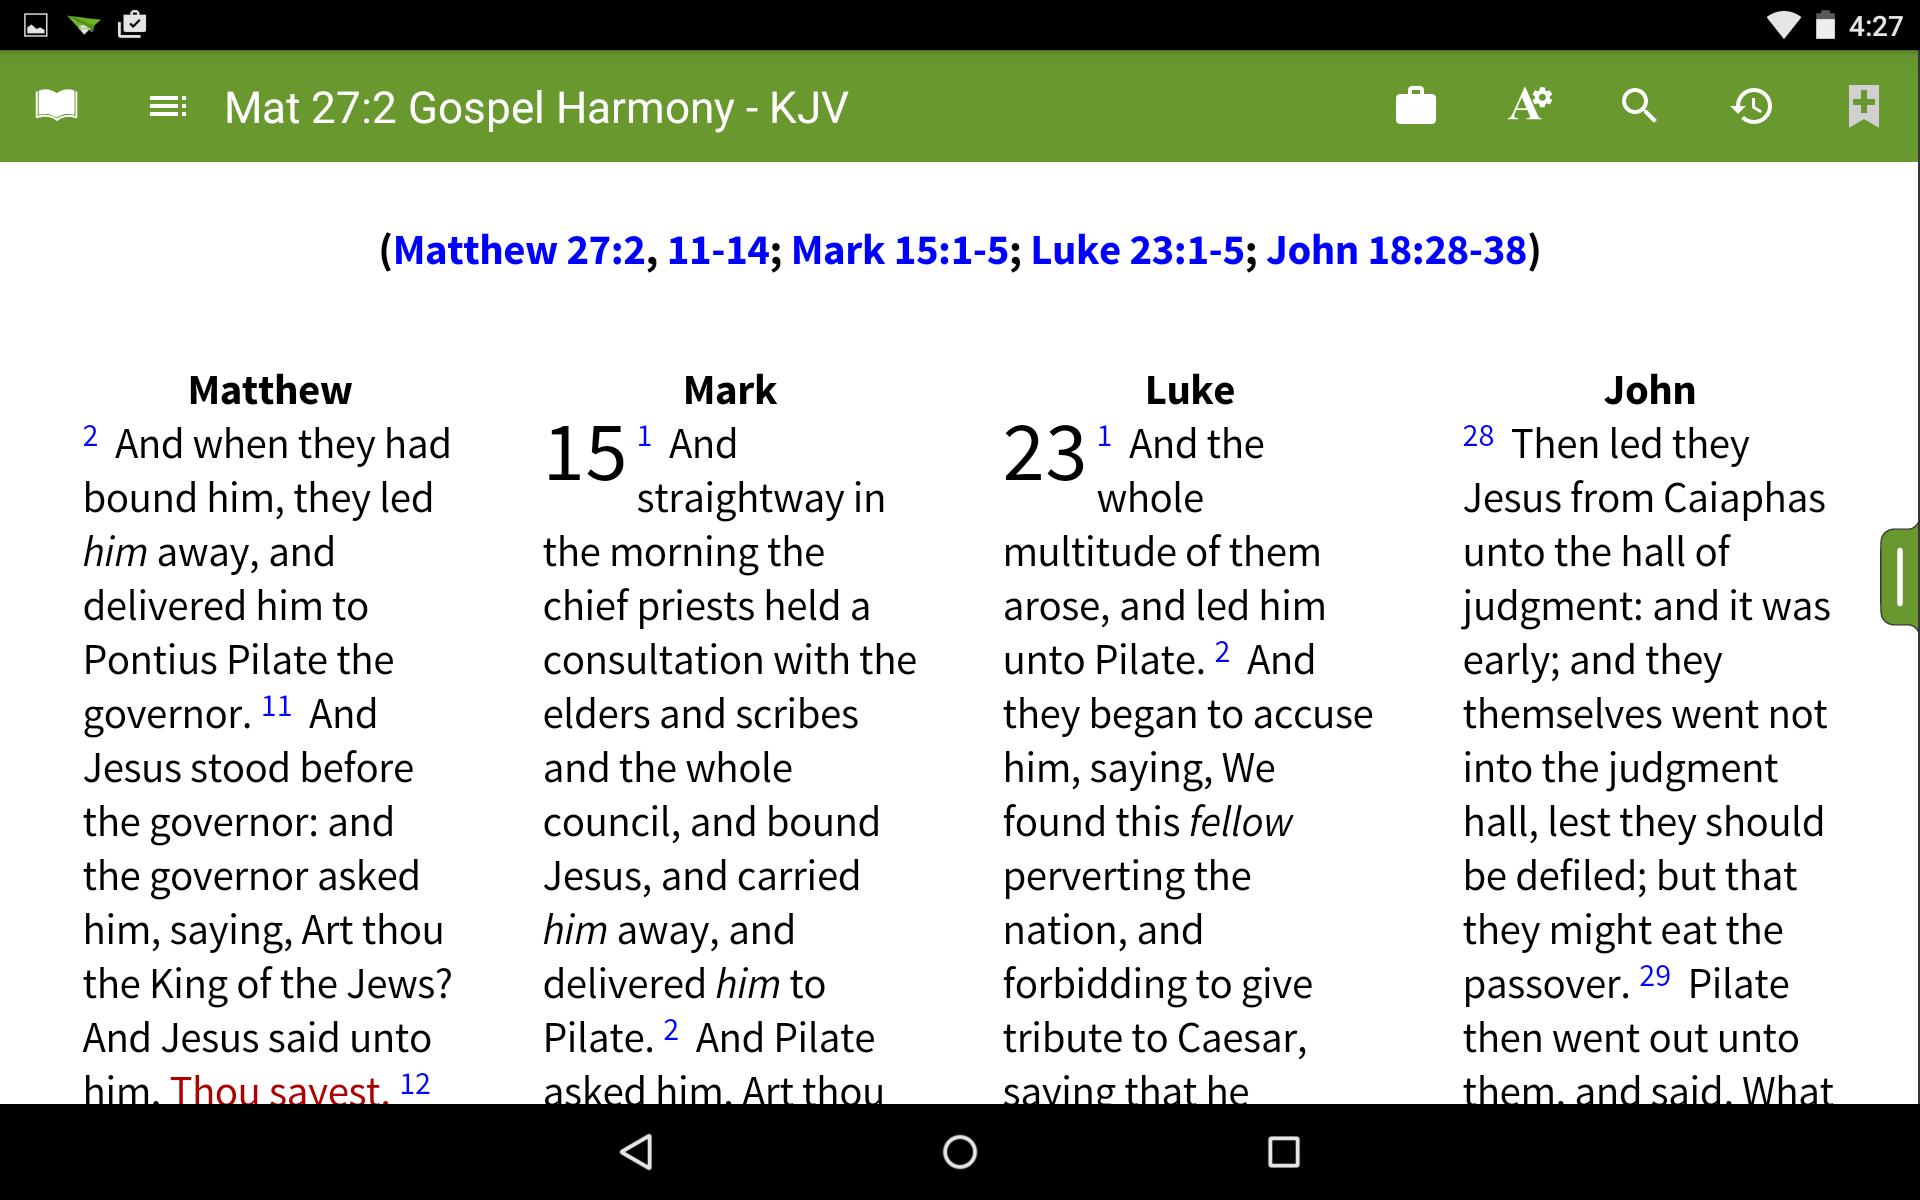 Harmony of the Gospels - Holman Bible Dictionary - Bible ...